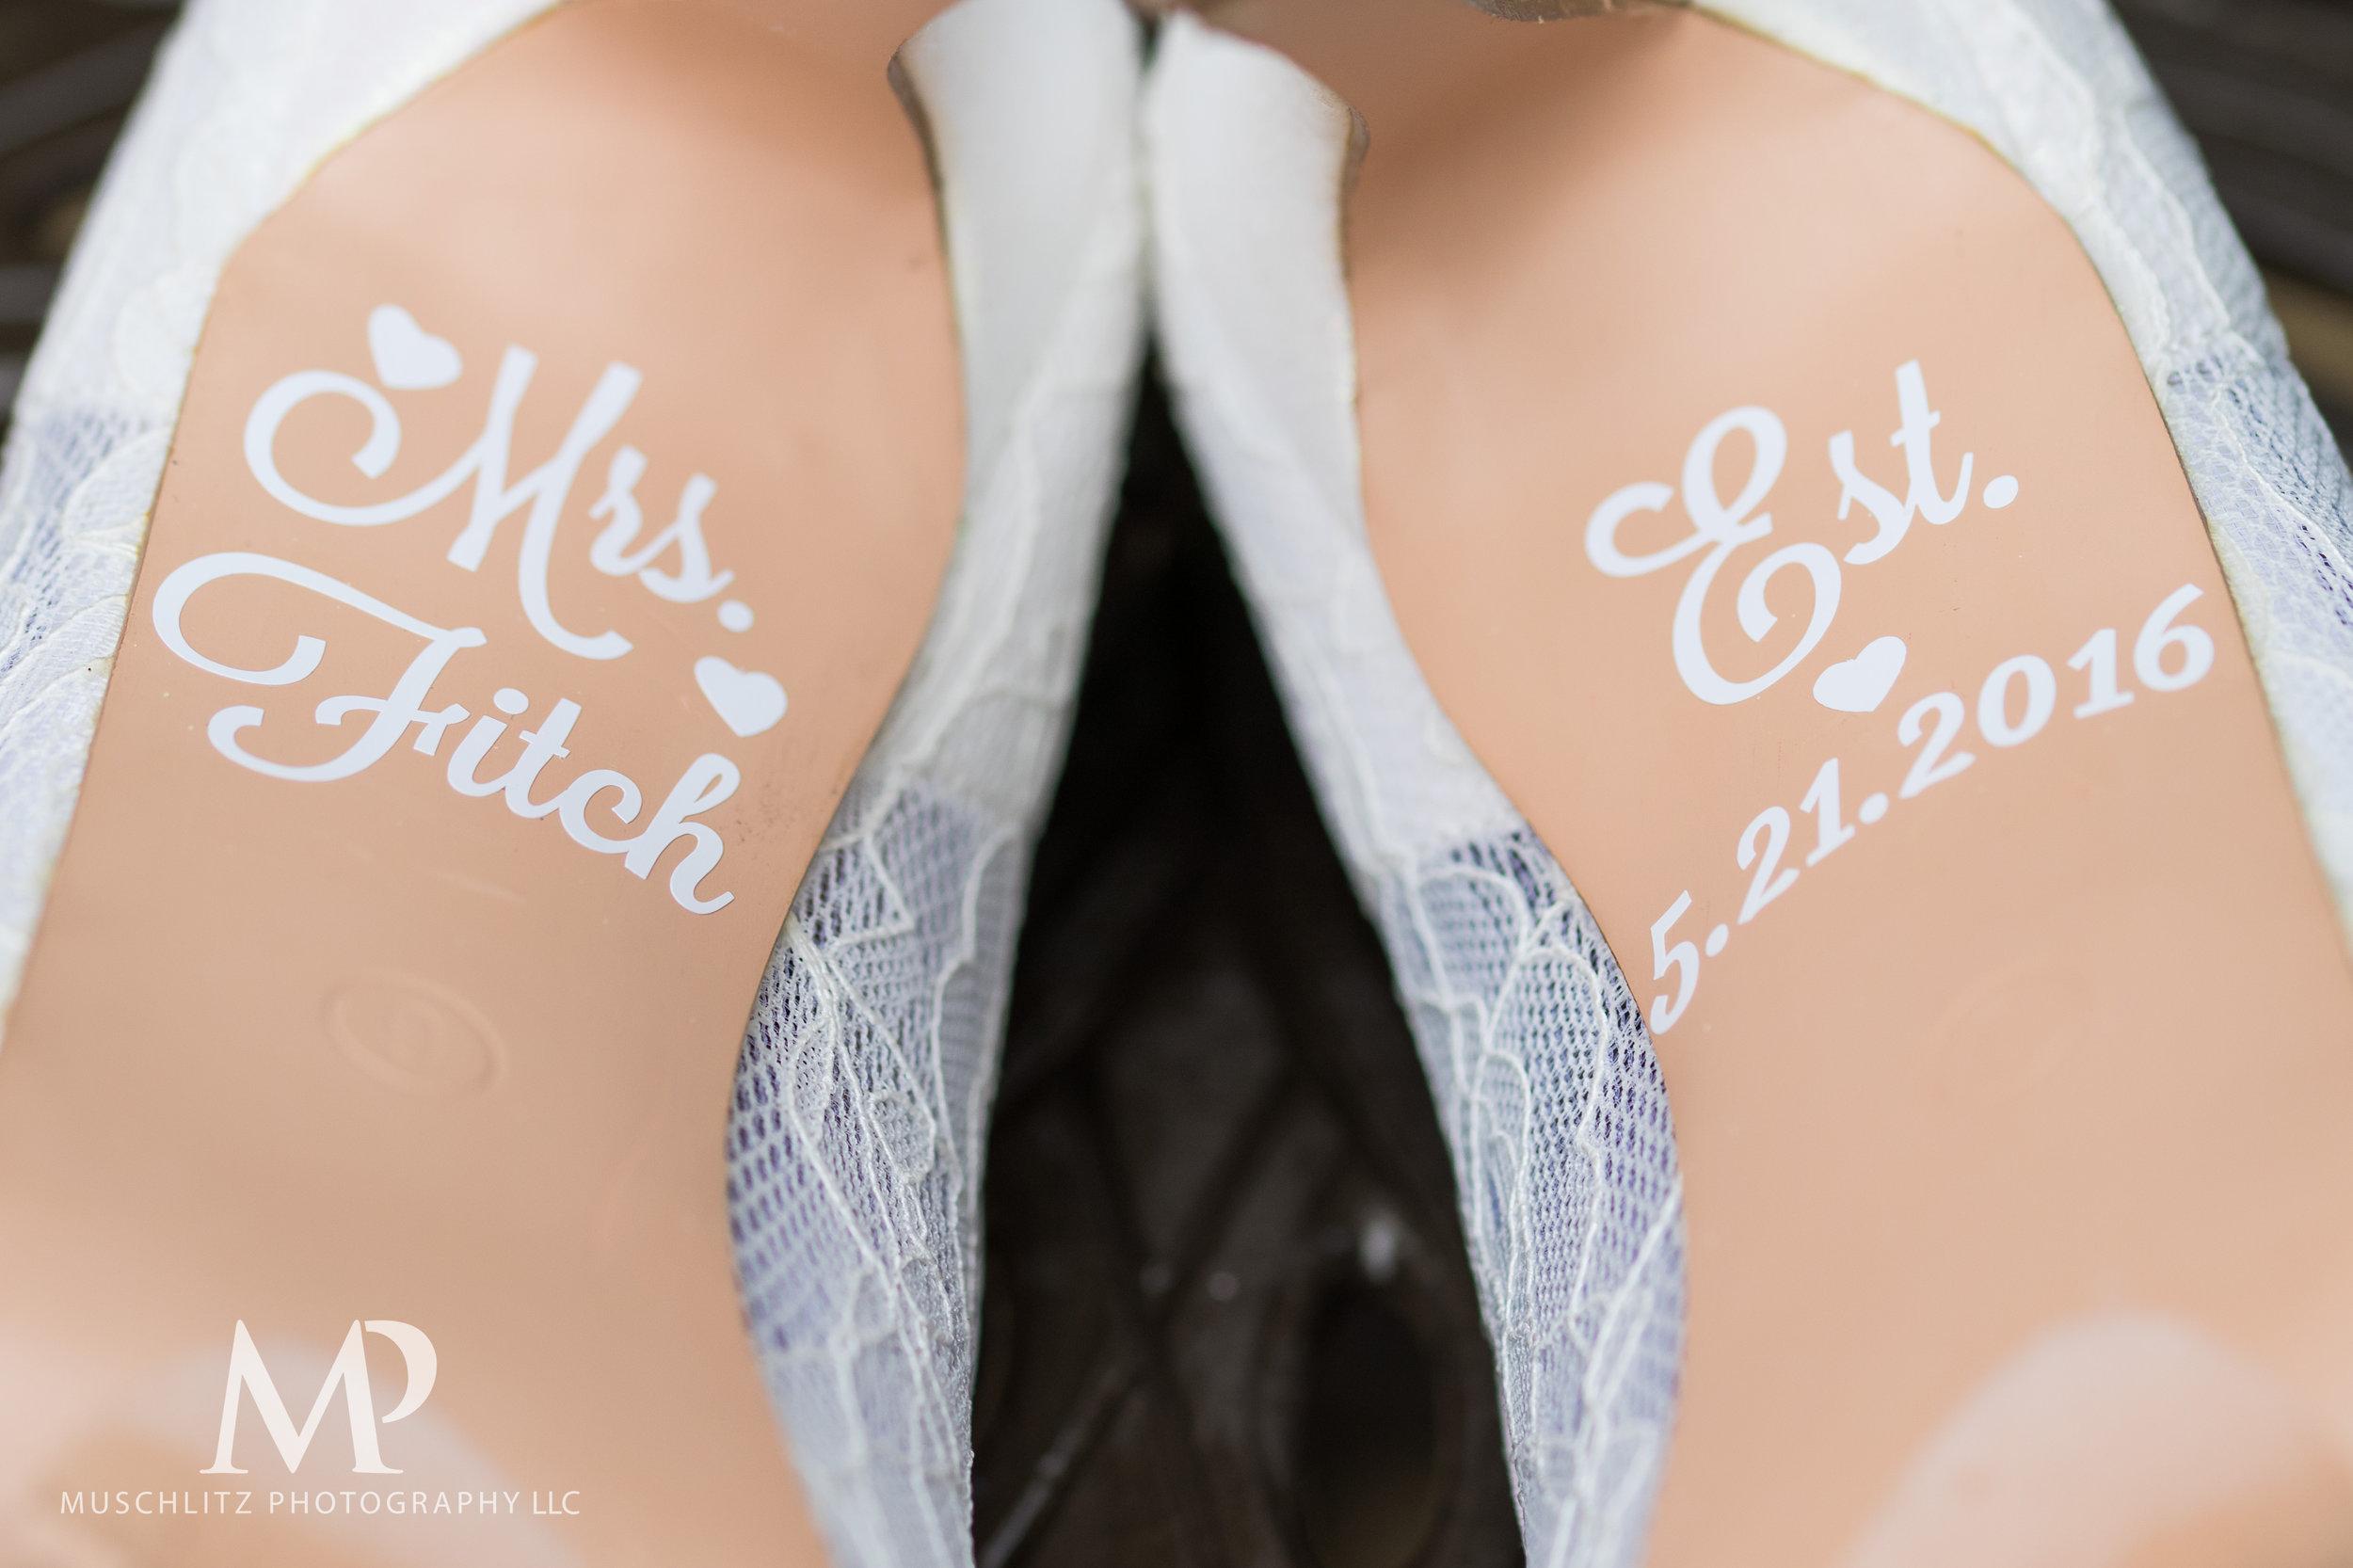 club-at-corazon-wedding-ceremony-reception-columbus-dublin-ohio-ohio-university-theme-011.JPG